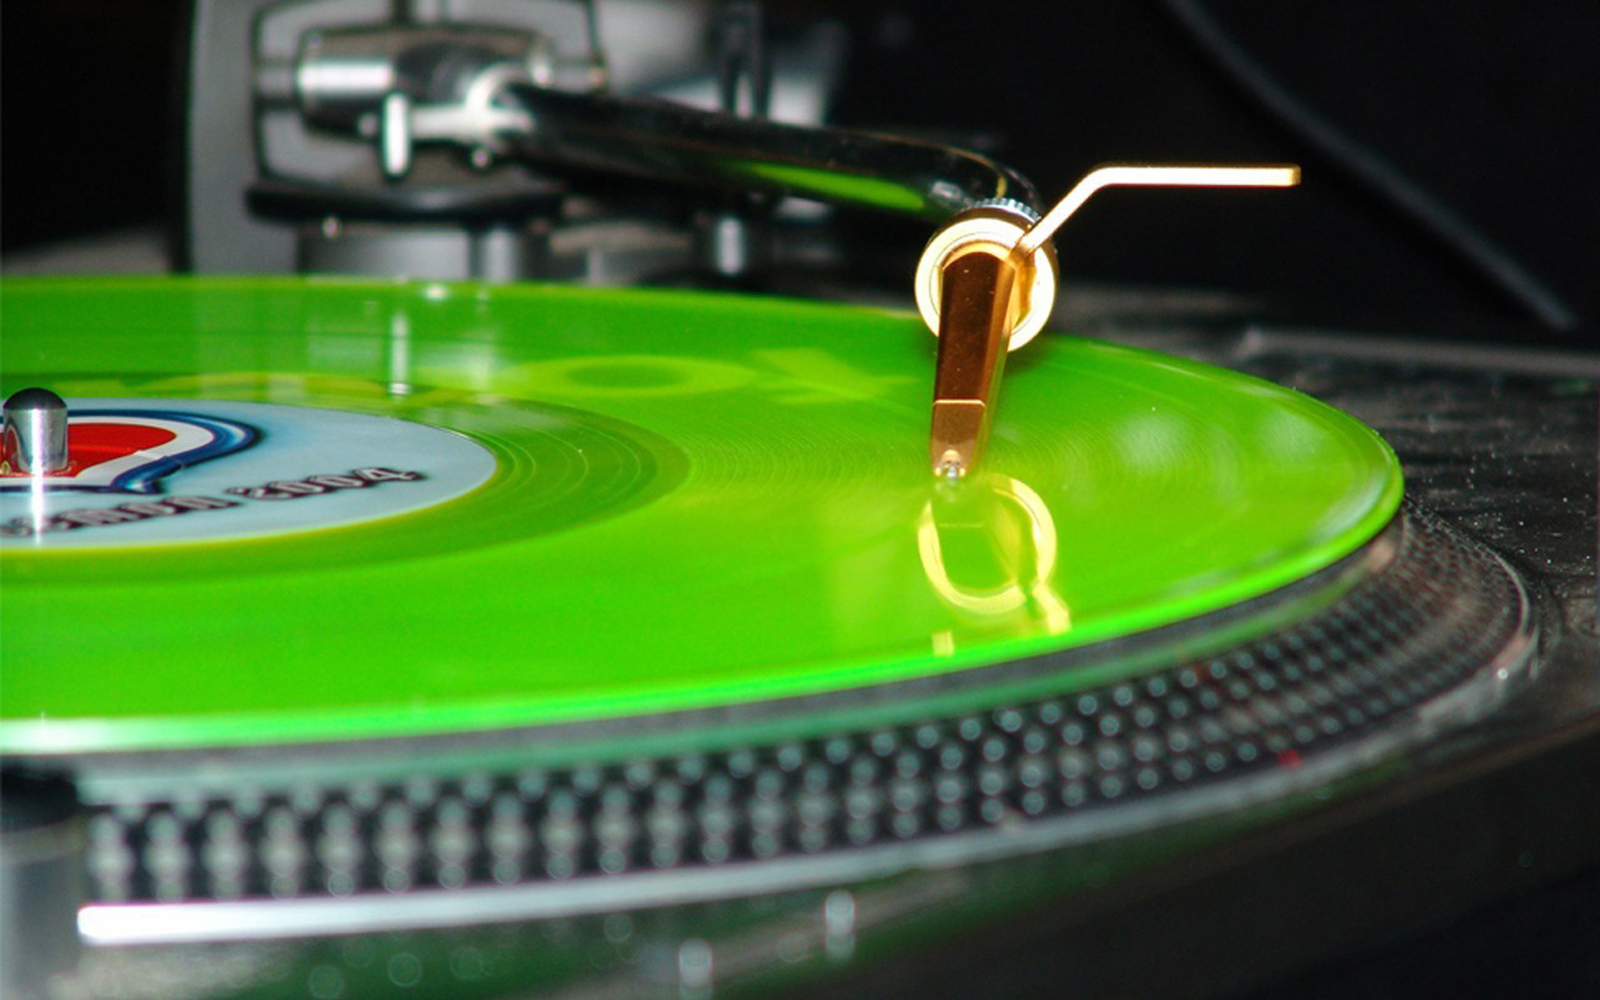 http://2.bp.blogspot.com/-nGCbCORKYvE/Too8cqTCgYI/AAAAAAAABdo/xU5tElWAkJo/s1600/Turntable_Record_Neon_Lamp_Green_Music_Gramaphone_HD_Wallpapers_Vvallpaper.net.jpg